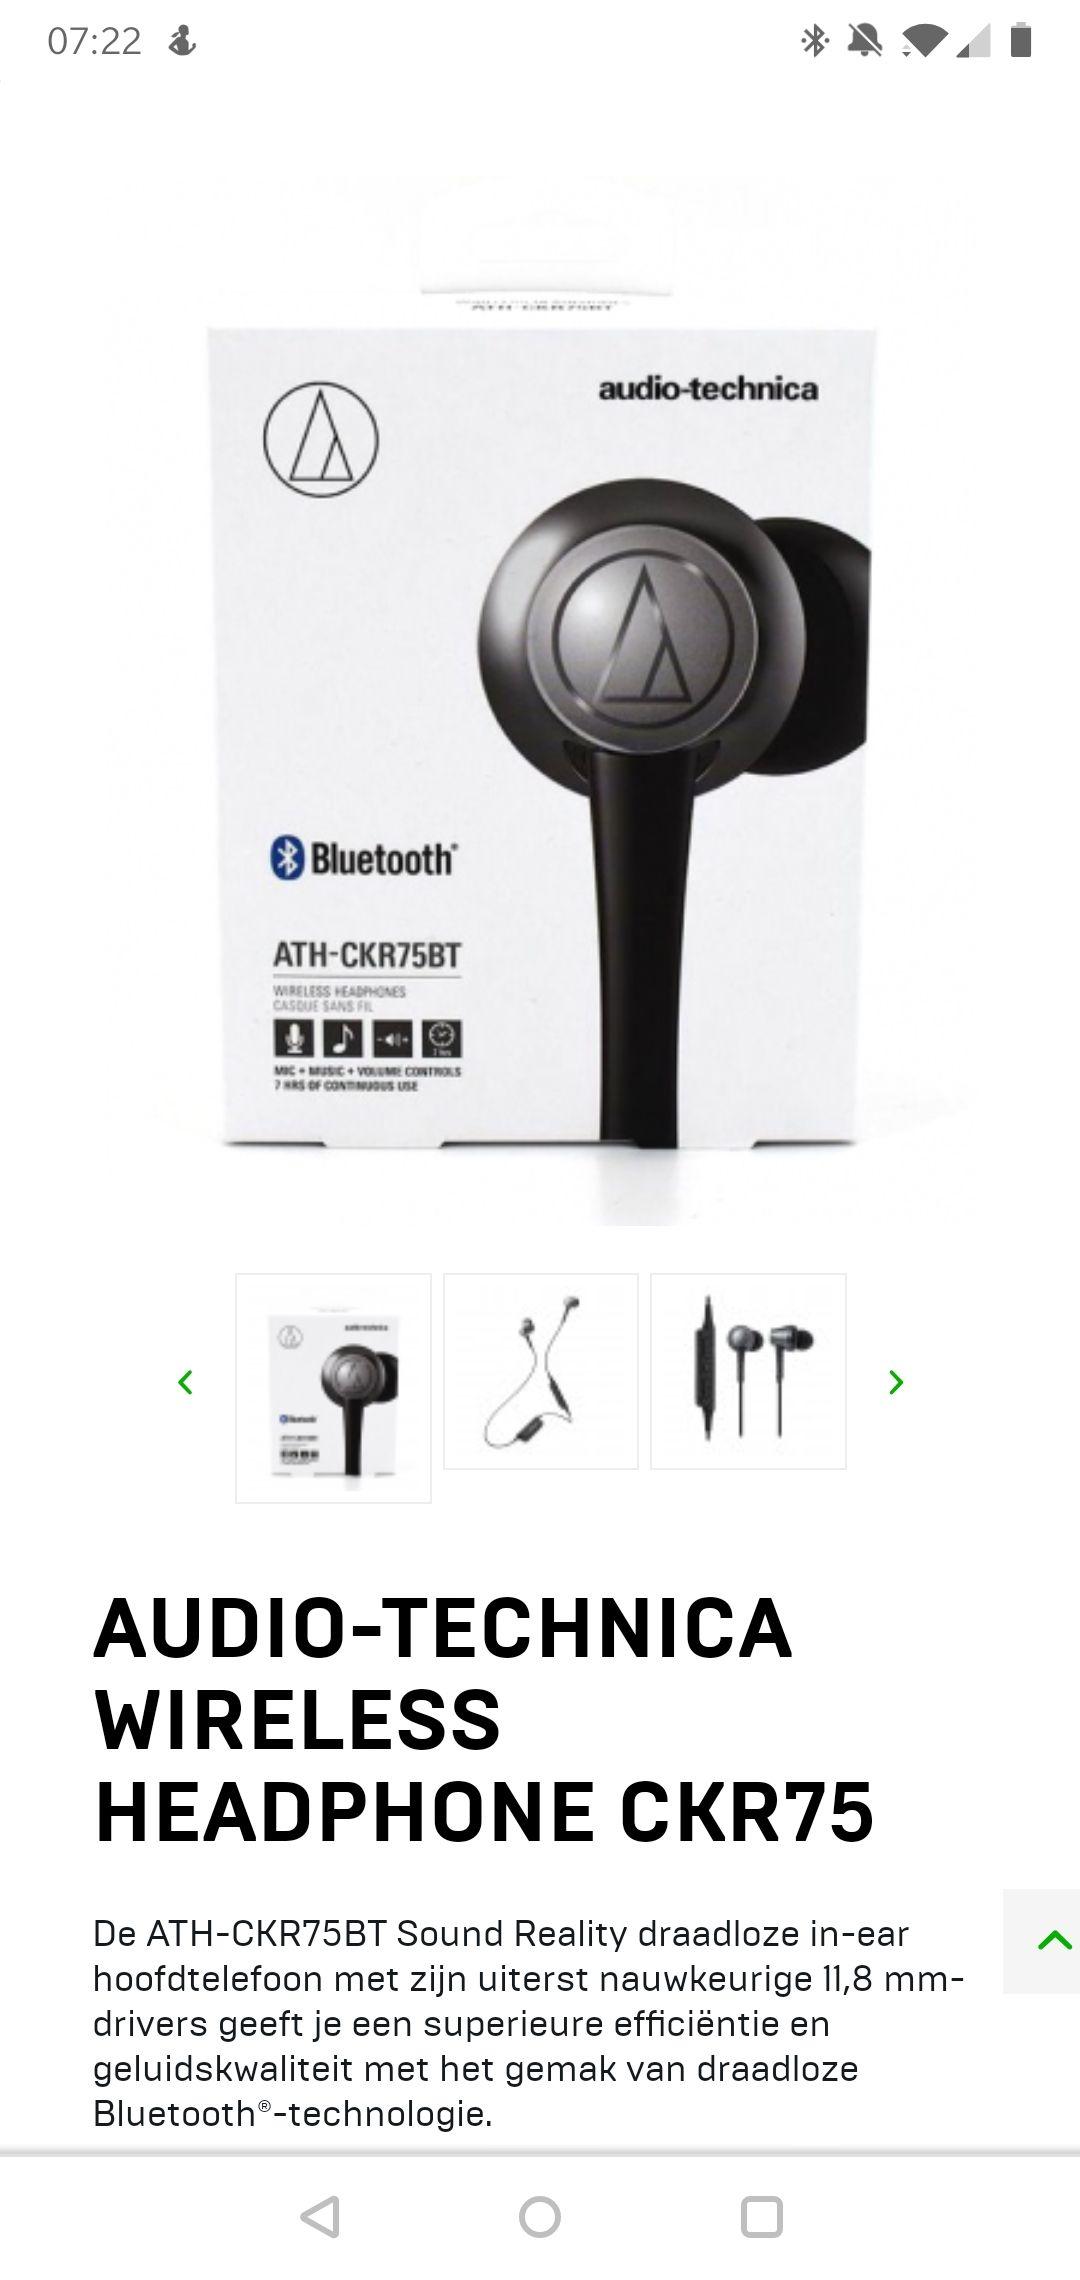 Audio-Technica Wireless Headphone CKR75